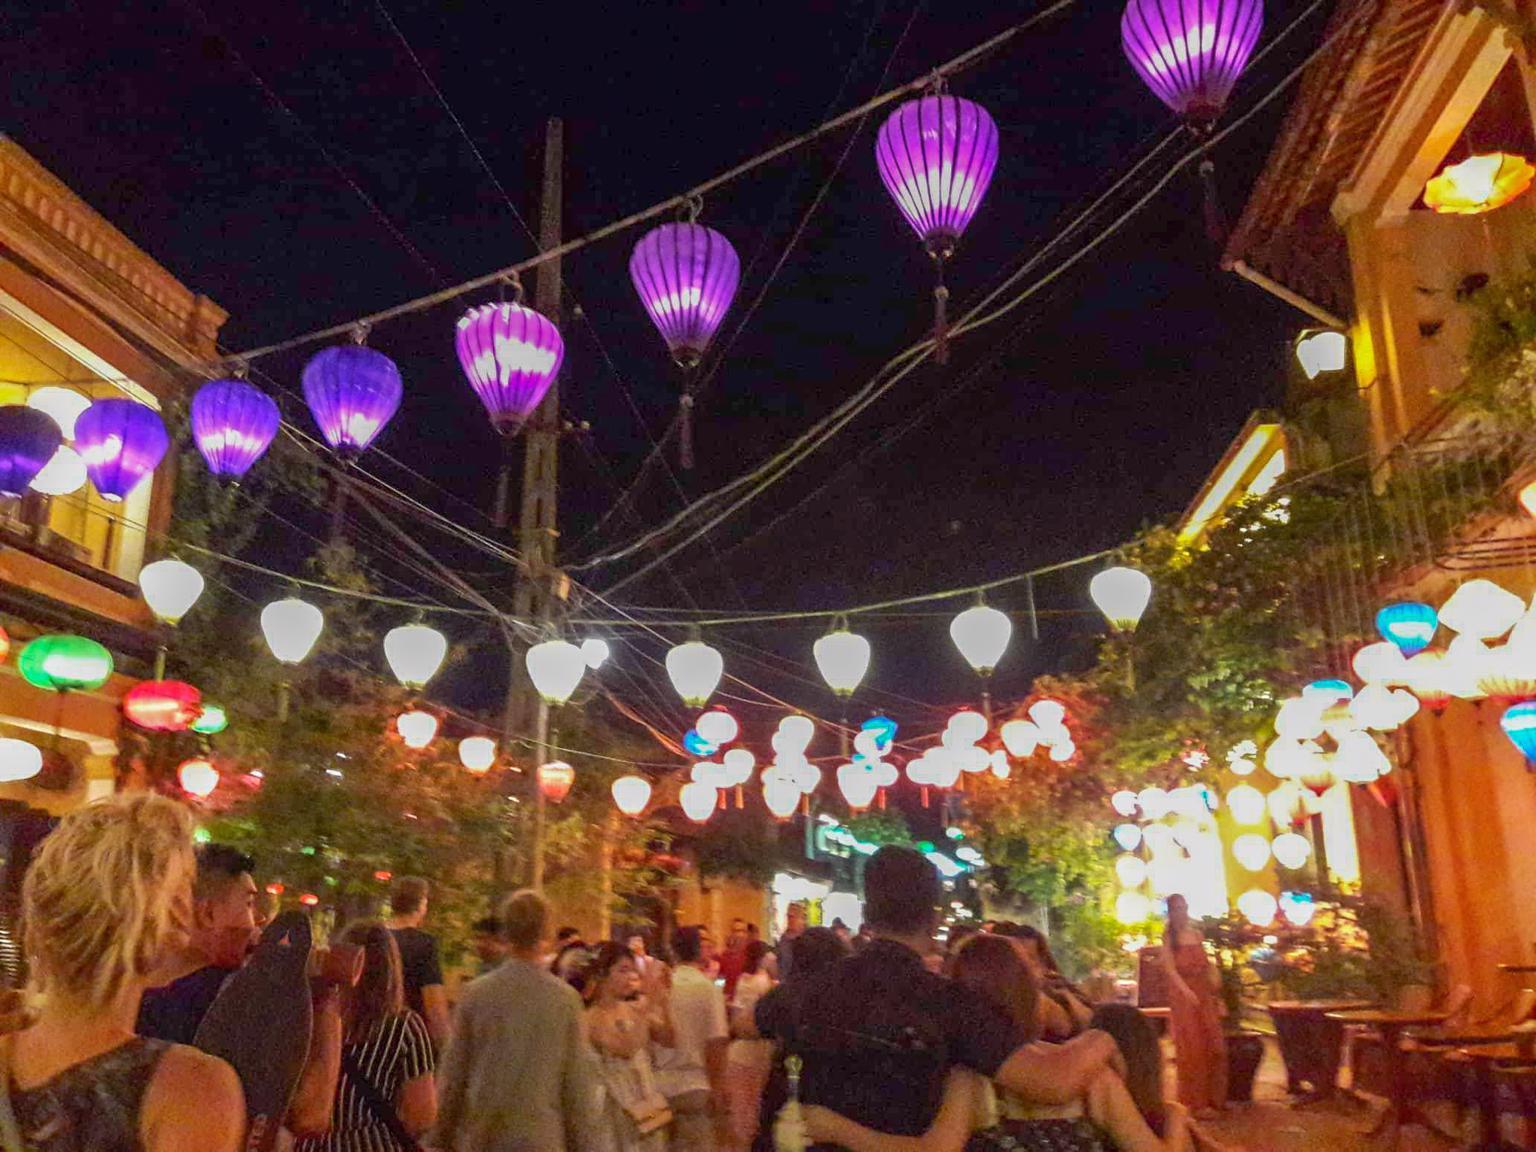 Hoi An Highlights - Hoi An Ancient Town at night